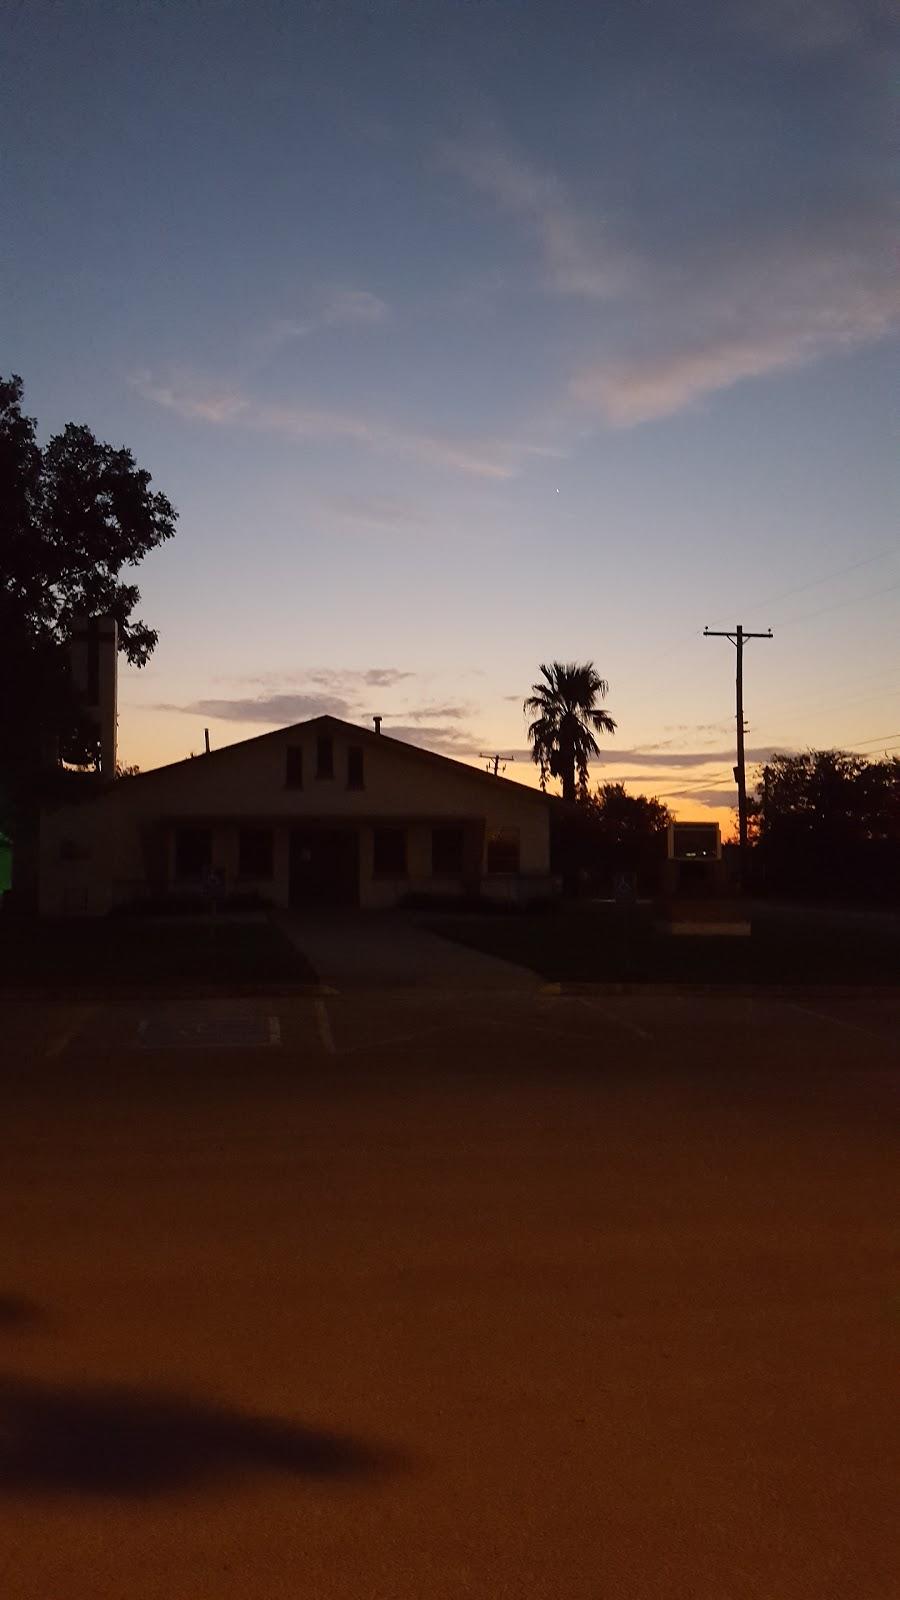 St Josephs Church - church  | Photo 3 of 3 | Address: 207 S Washington Ave, Nixon, TX 78140, USA | Phone: (830) 582-1127